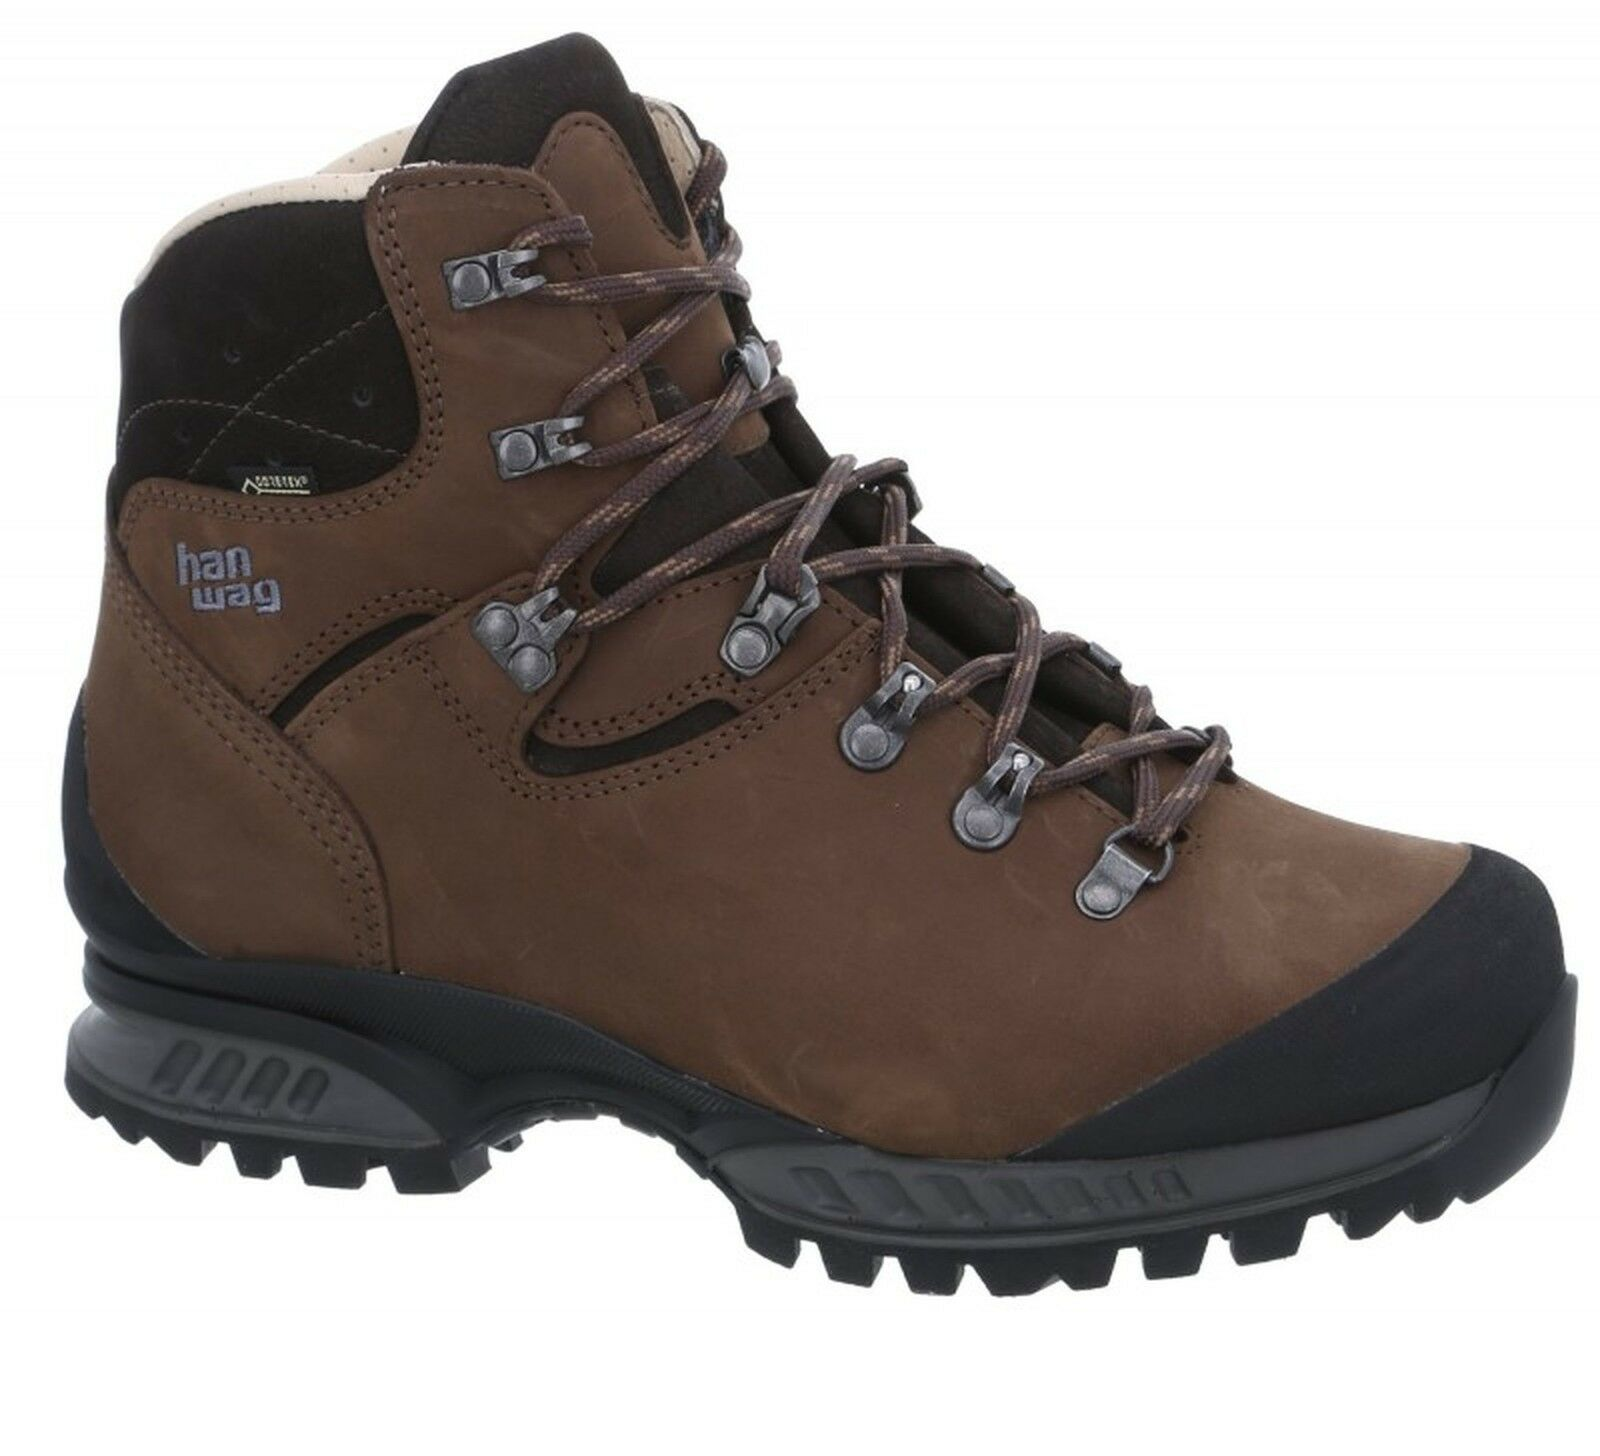 Hanwag Trekking shoes Tatra II Wide GTX Size 10,5 - 45 Earth